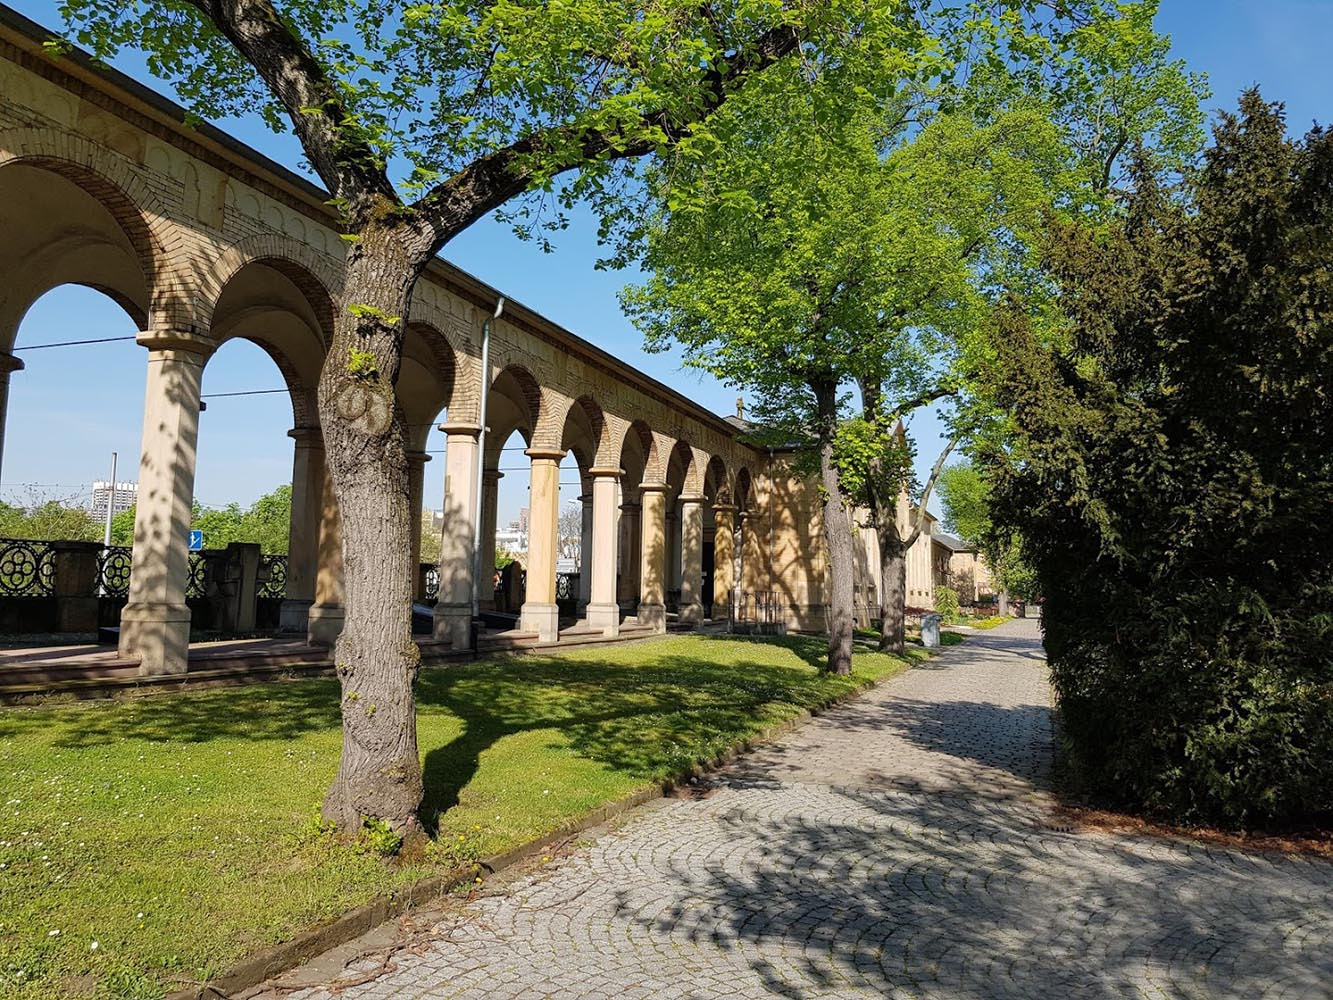 Hauptfriedhof Arkadenbau, Mannheim